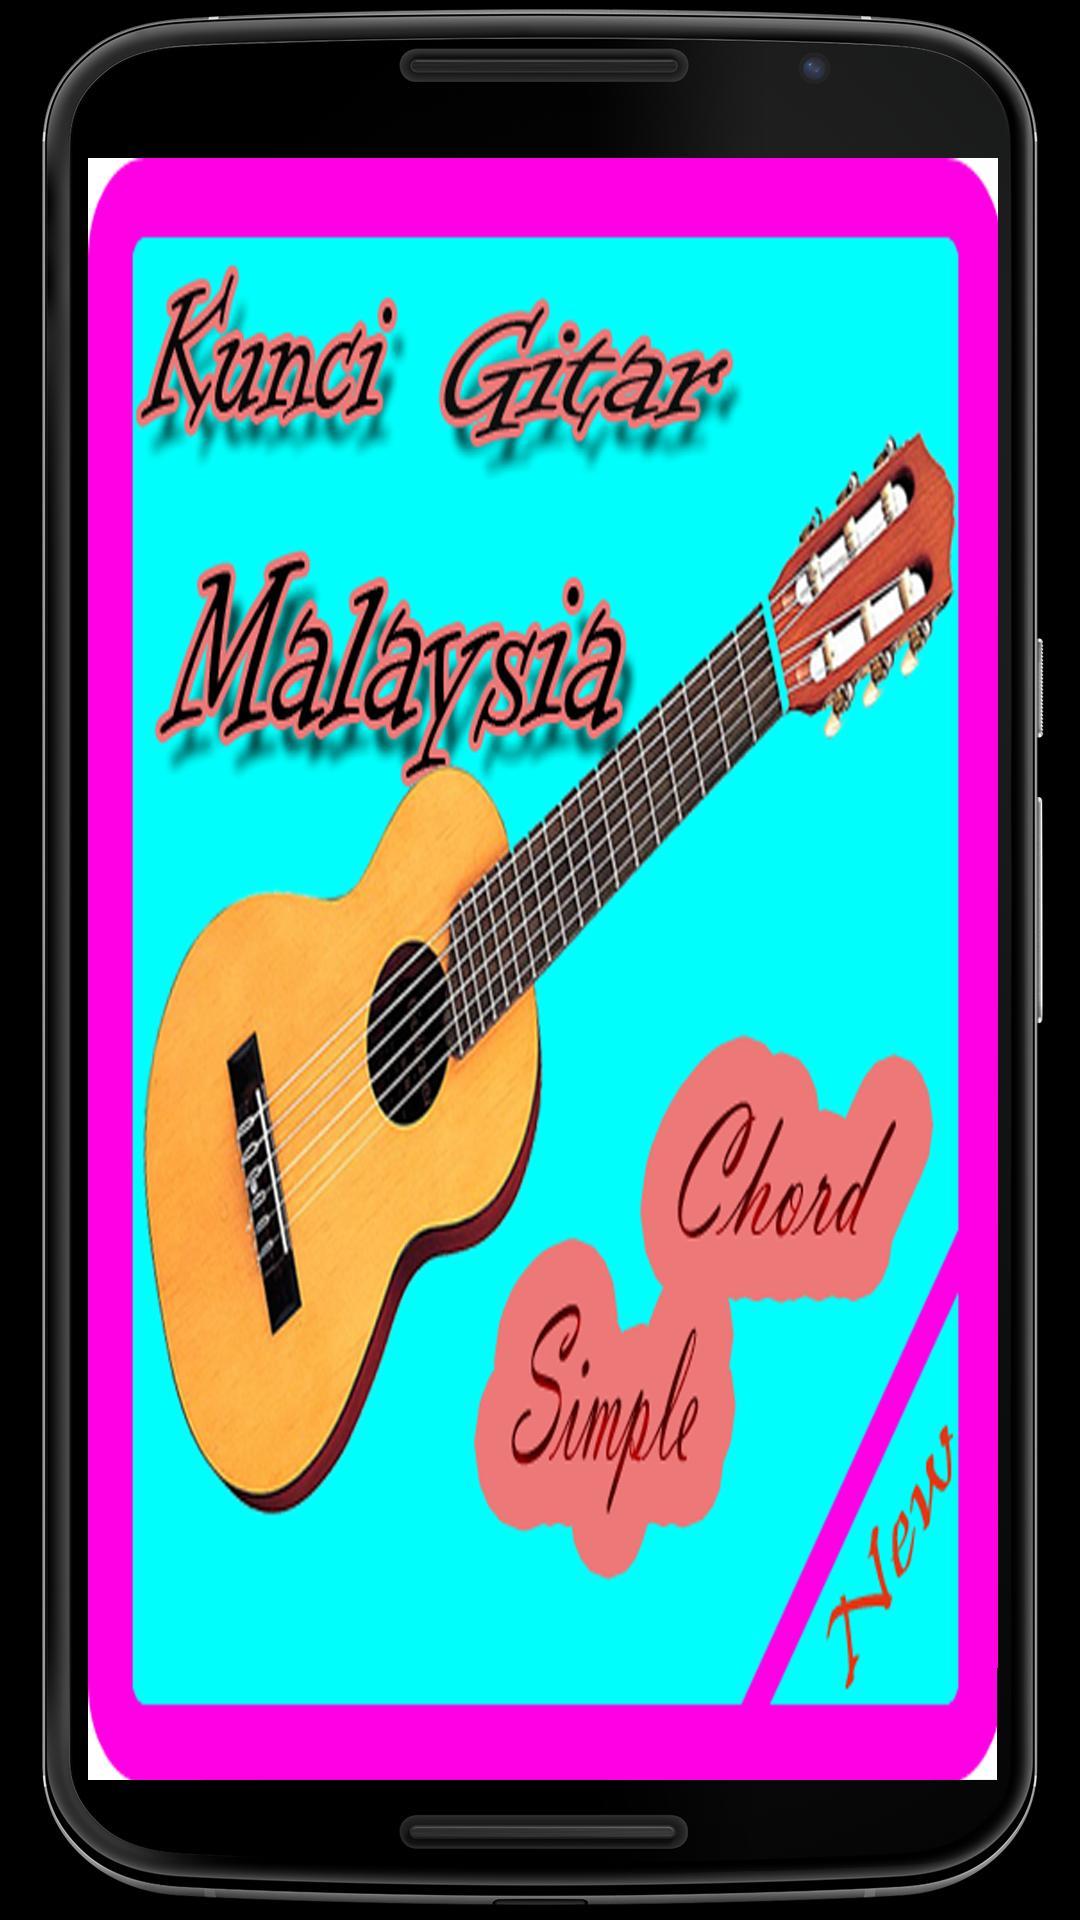 Kunci Gitar Malaysia Full Album Fur Android Apk Herunterladen